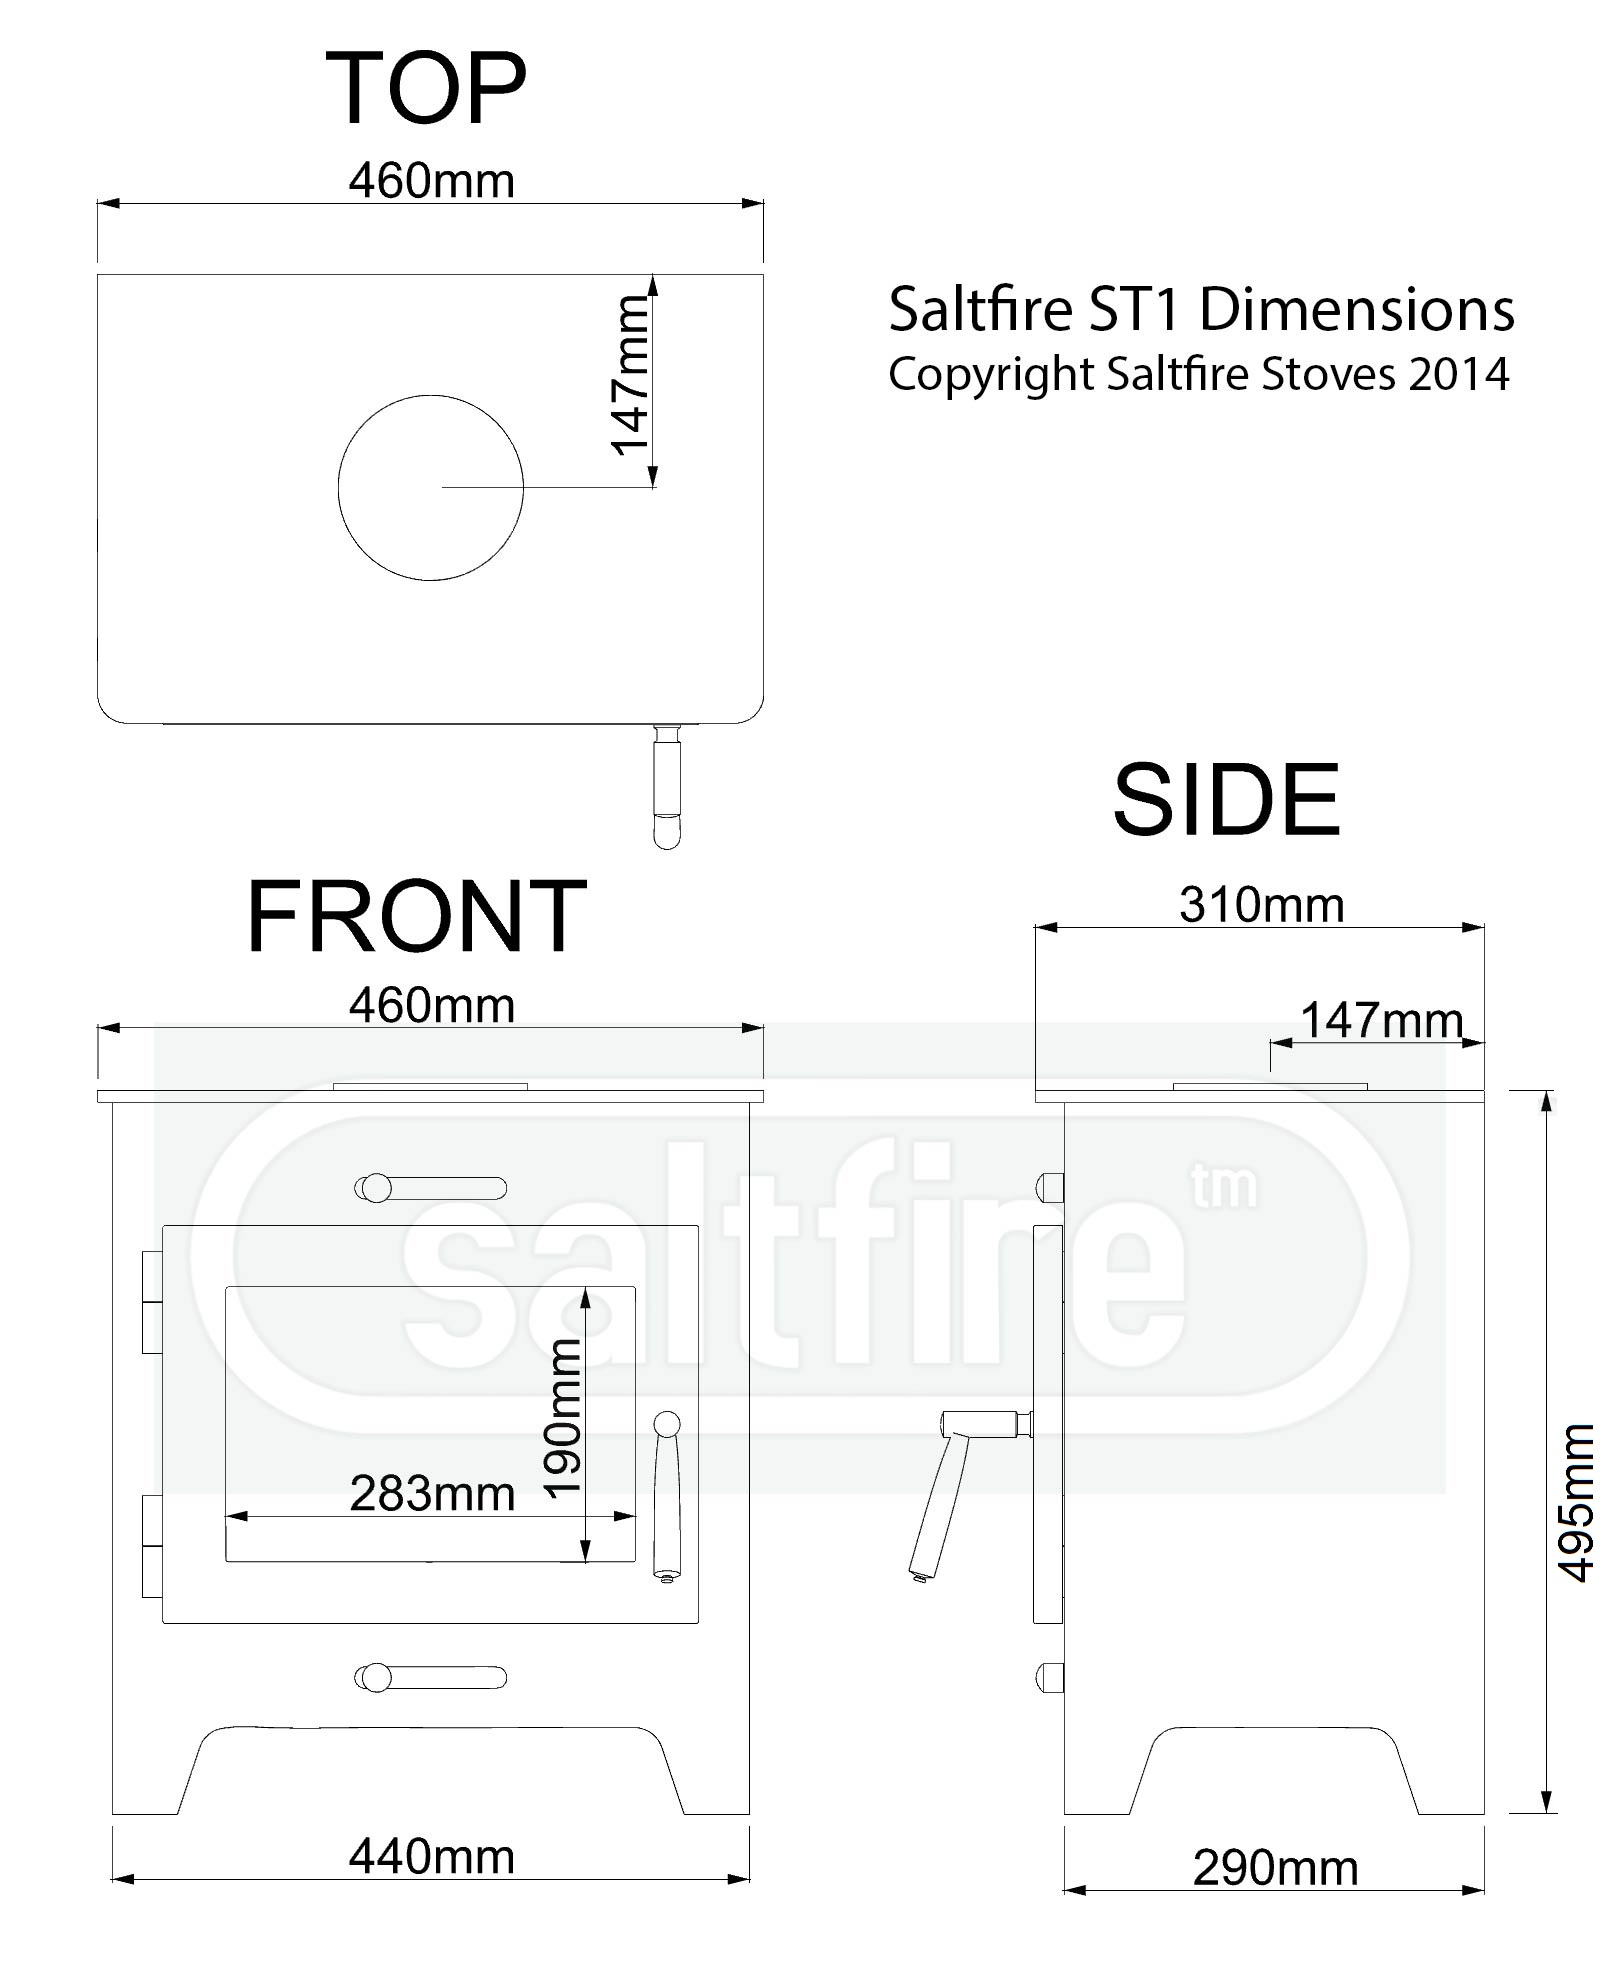 saltfire-st1-stove-dimensions.jpg